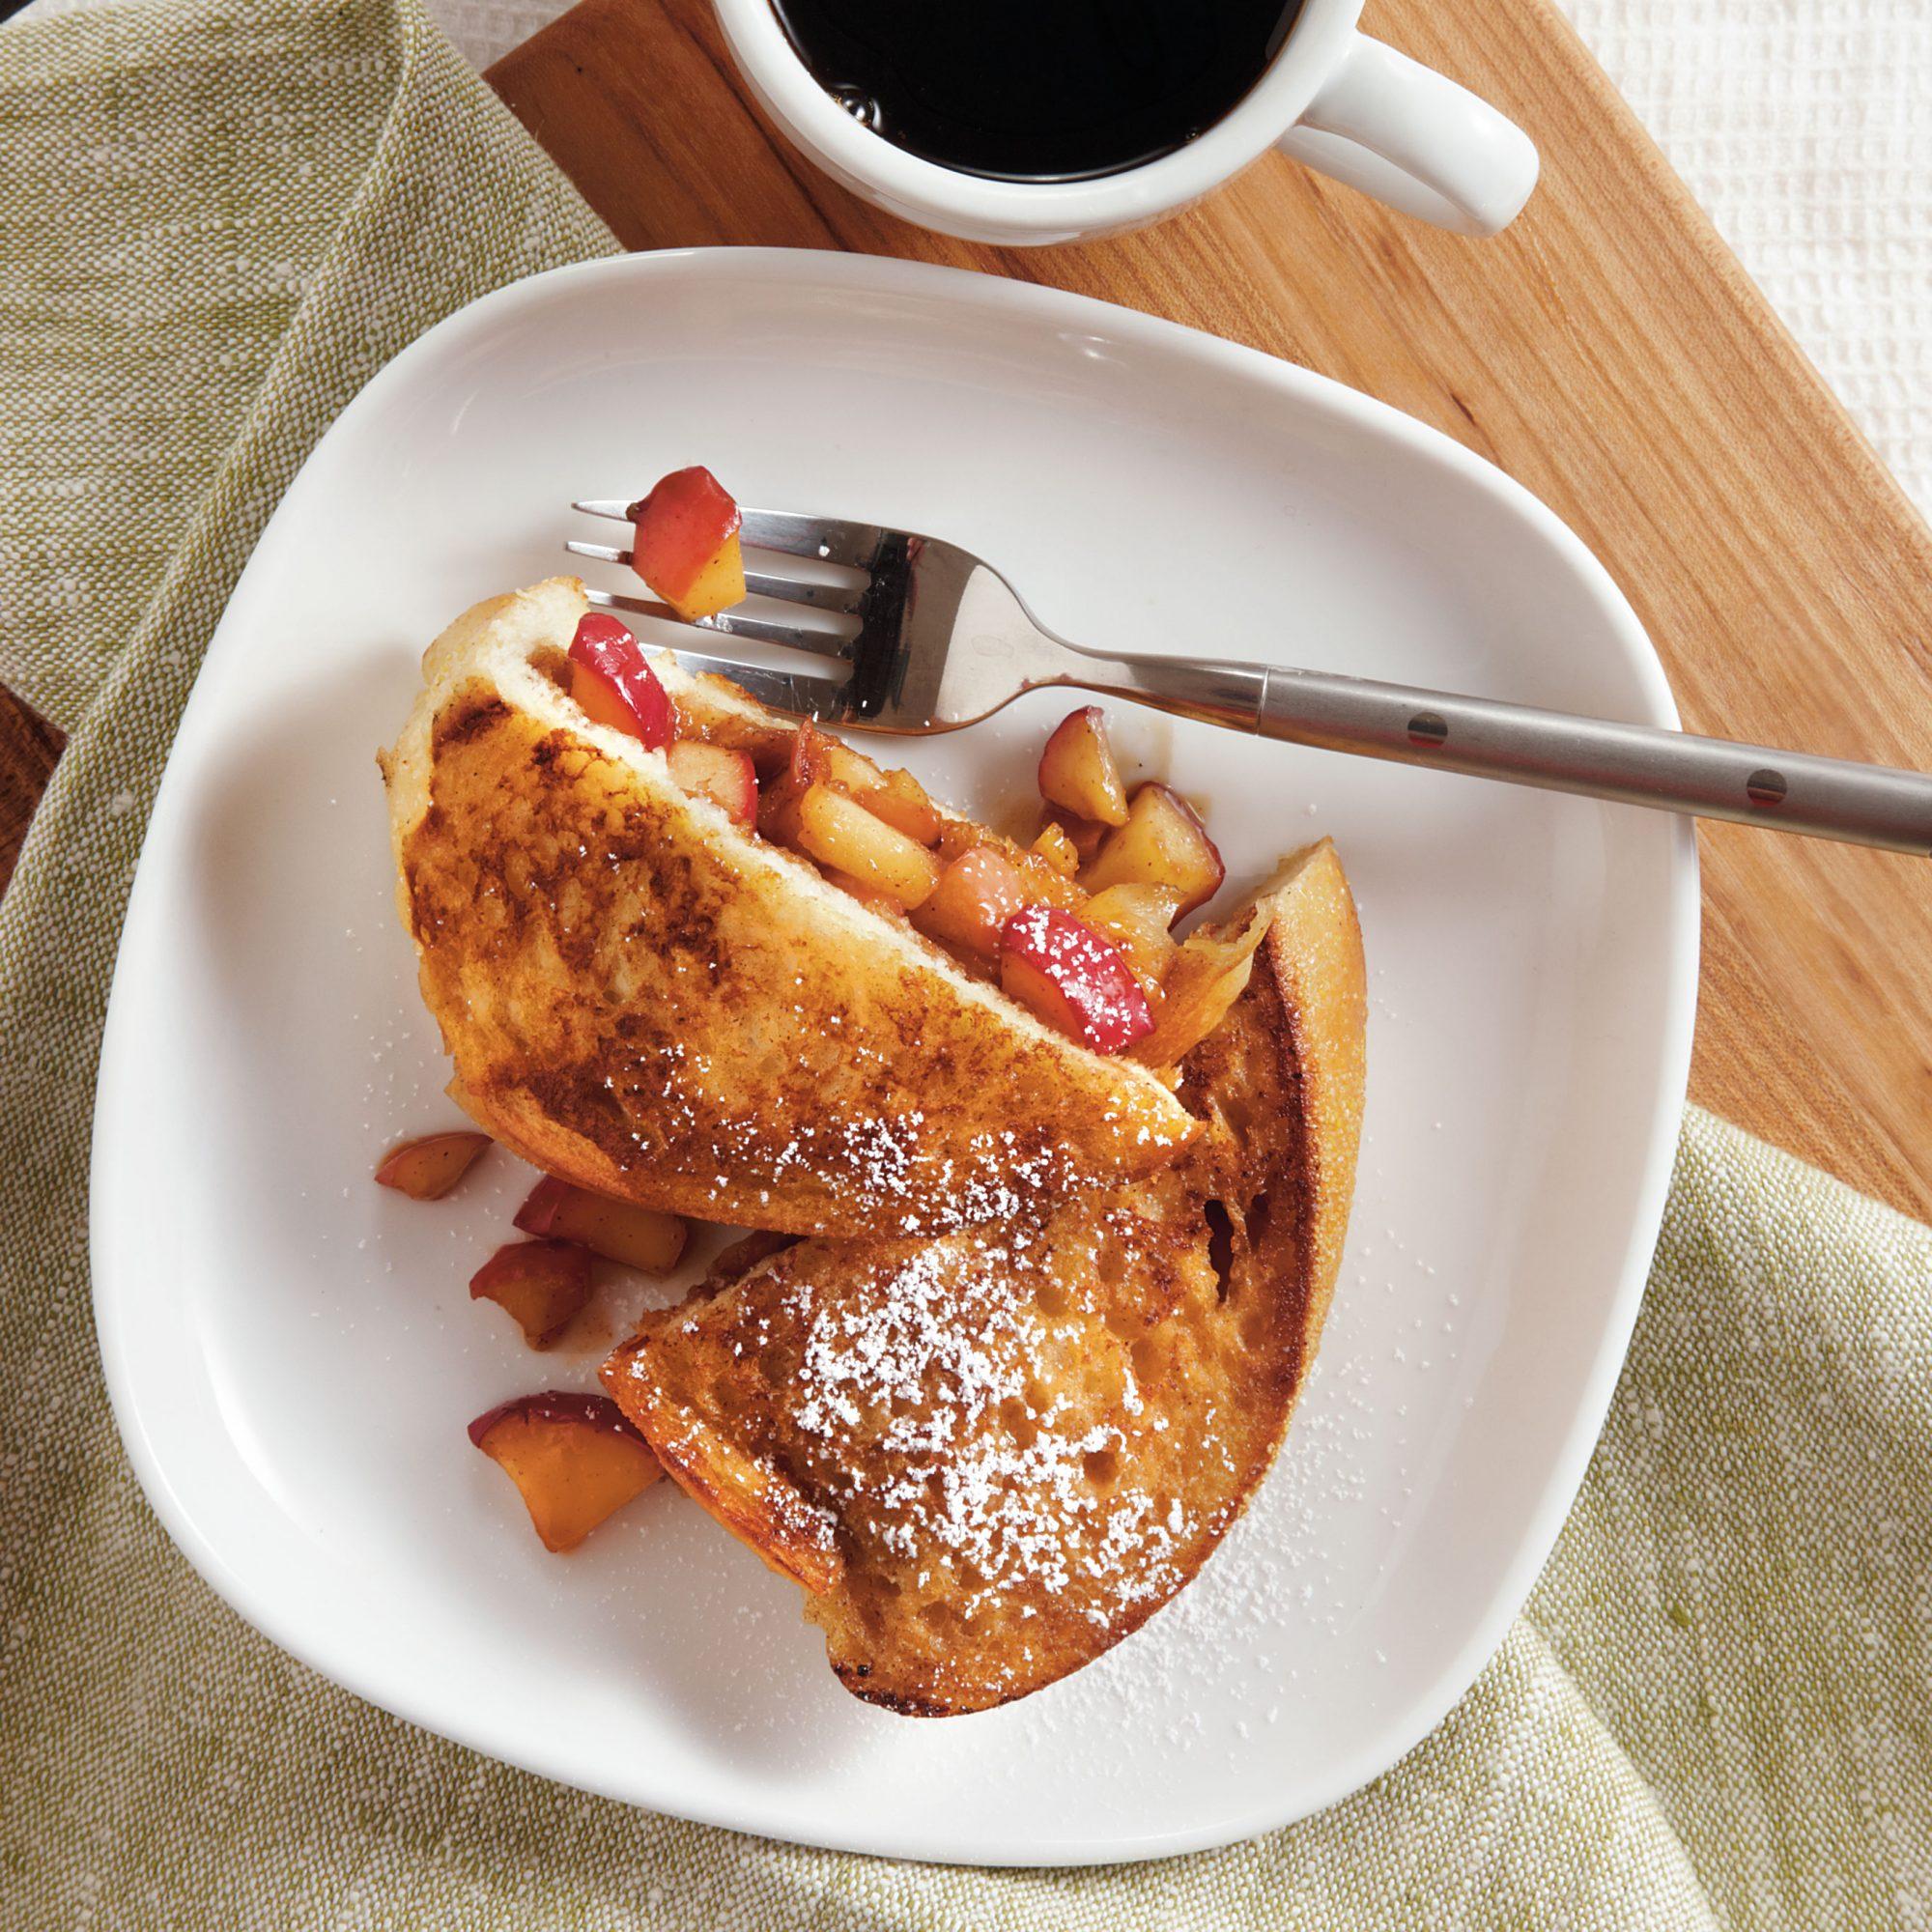 <p>Cinnamon-Apple Stuffed French Toast</p>